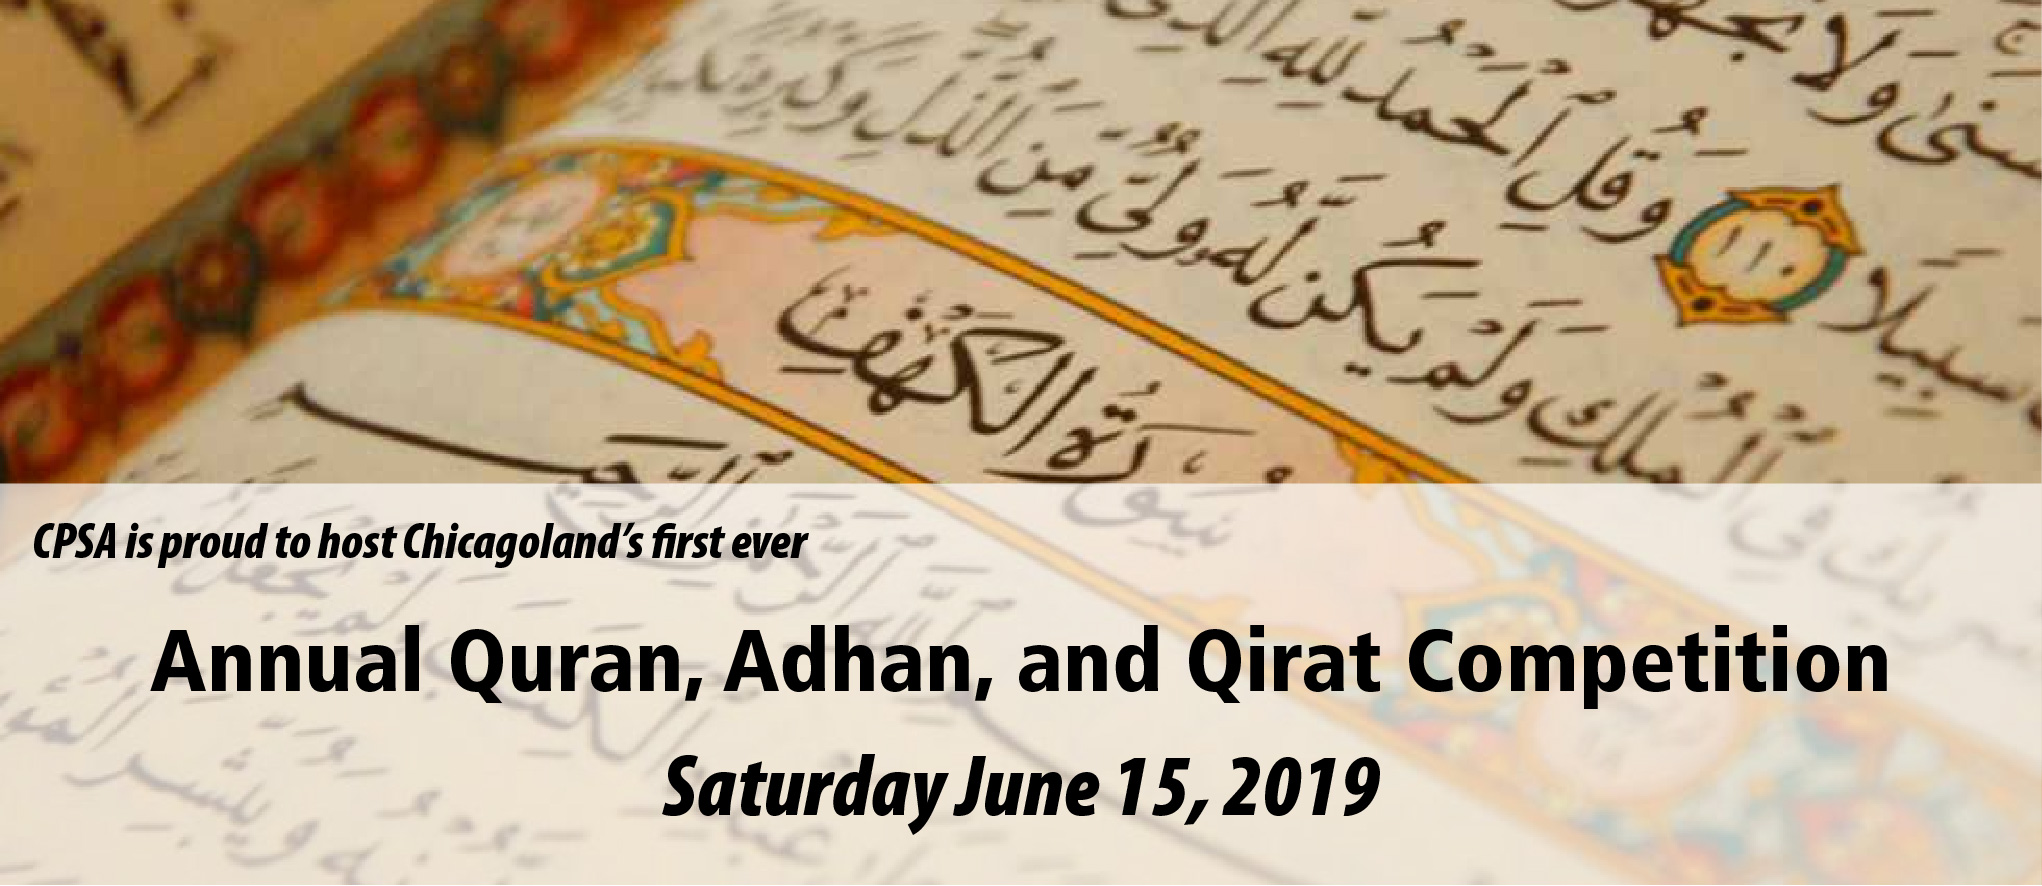 CPSA Quran Competition 2019